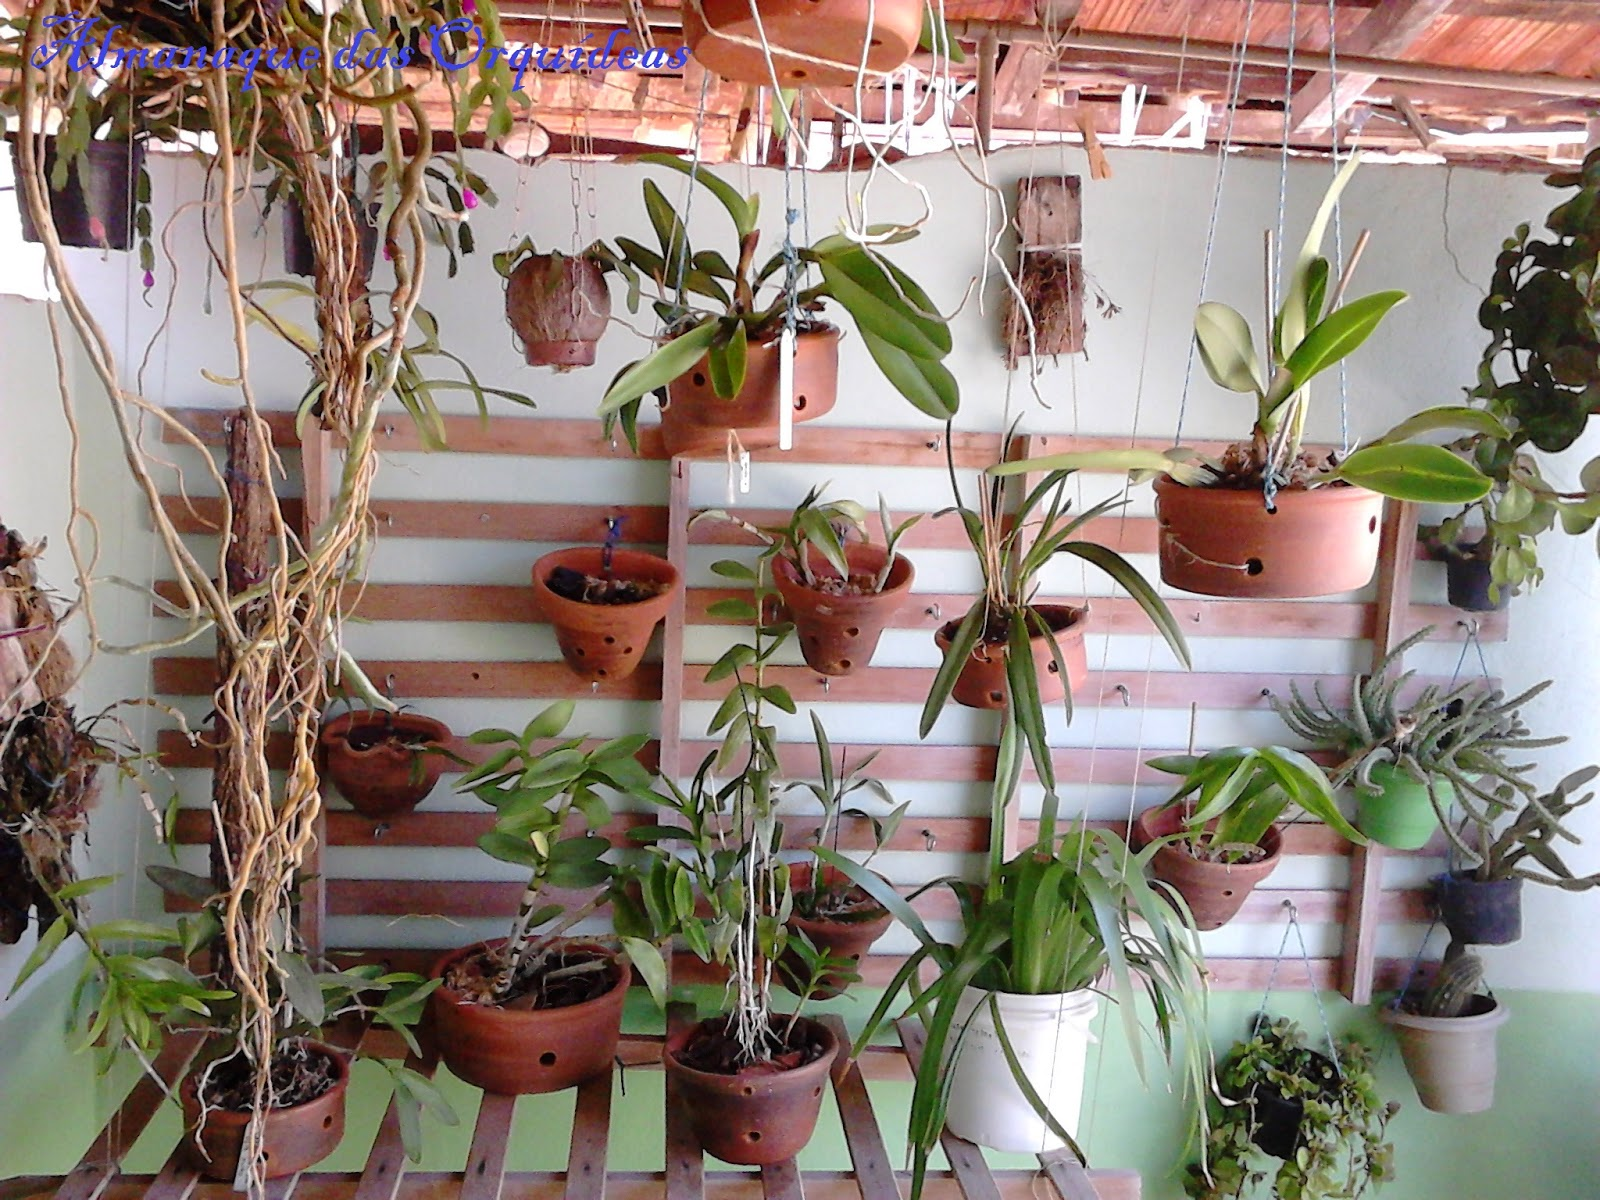 jardim vertical lisboa:jardim vertical com orquidea 14